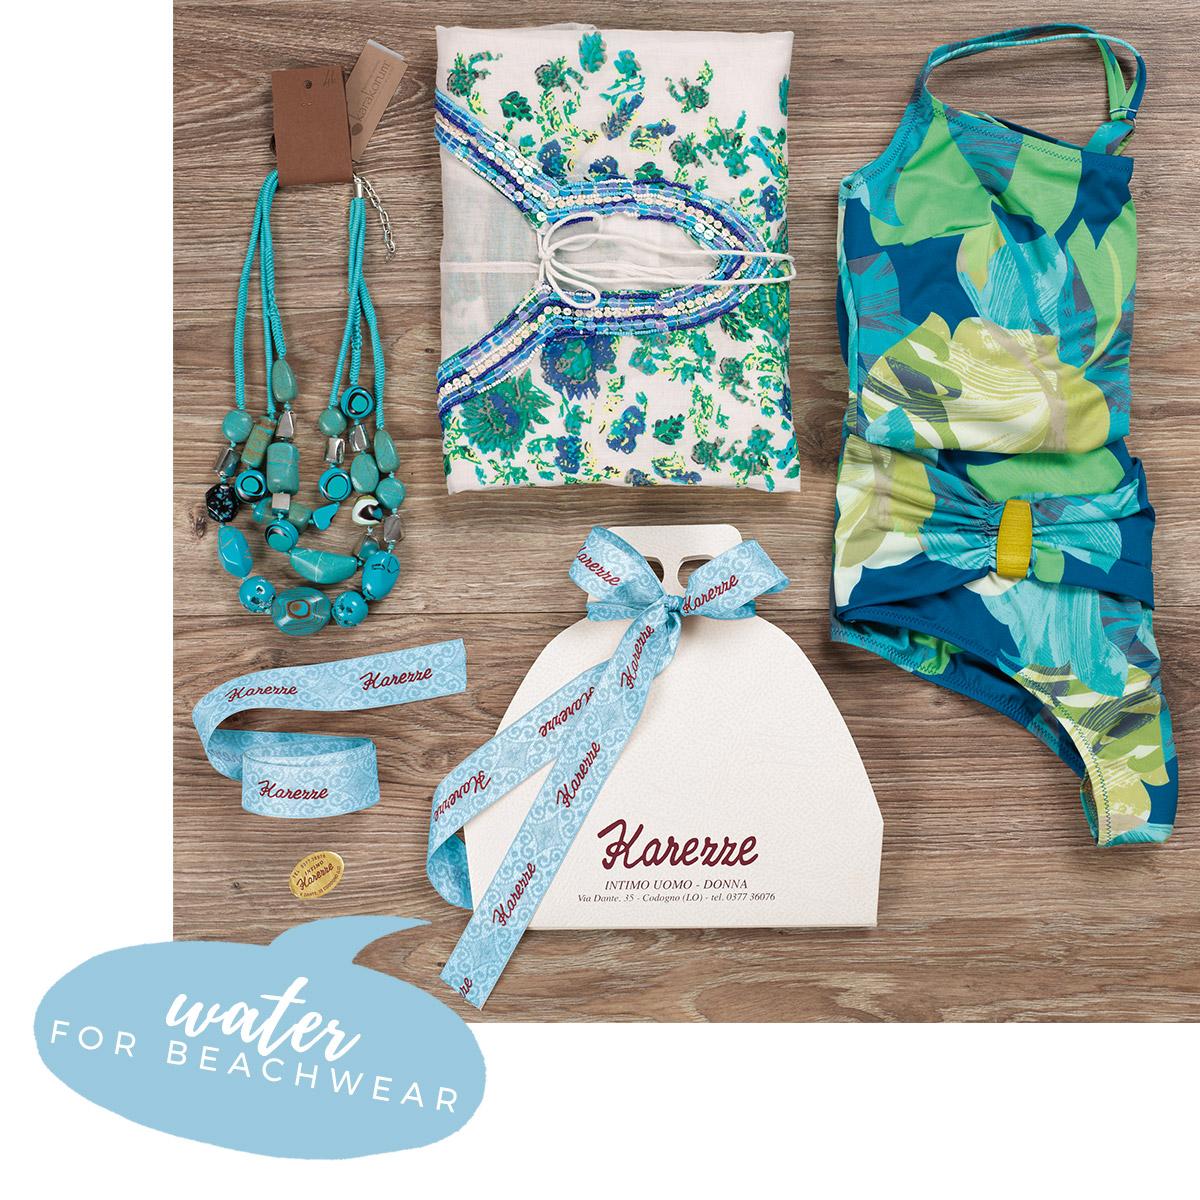 water for beachwear